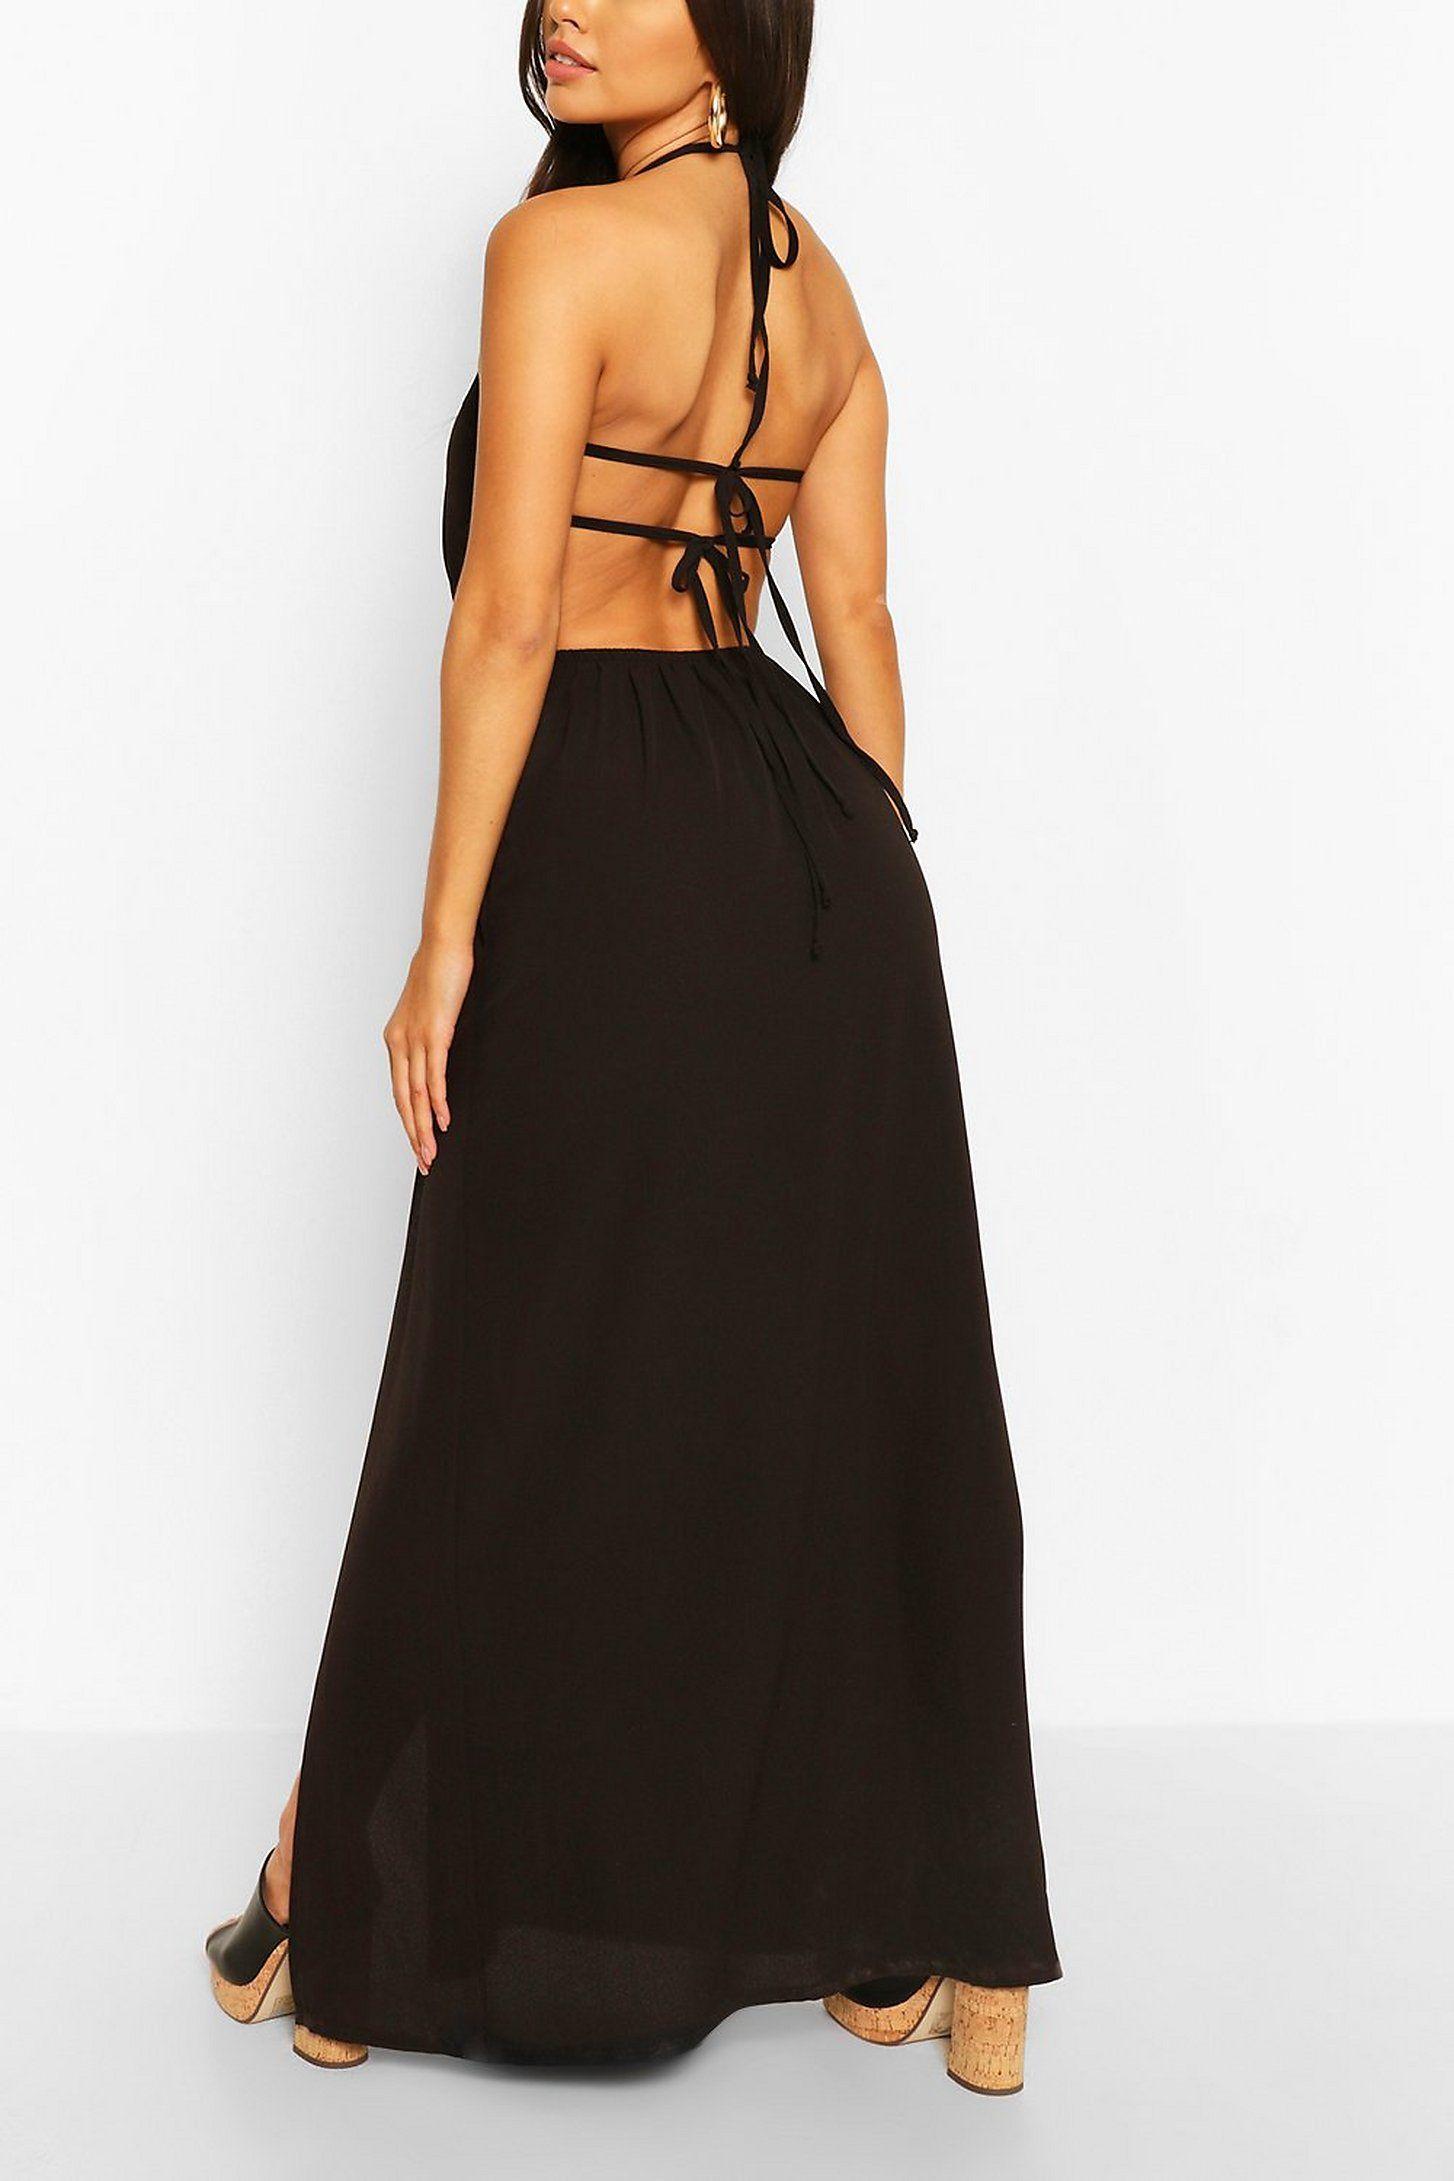 Woven Strappy Back Halterneck Split Maxi Dress Boohoo Split Maxi Dress Maxi Dress Collection Latest Maxi Dresses [ 2181 x 1454 Pixel ]